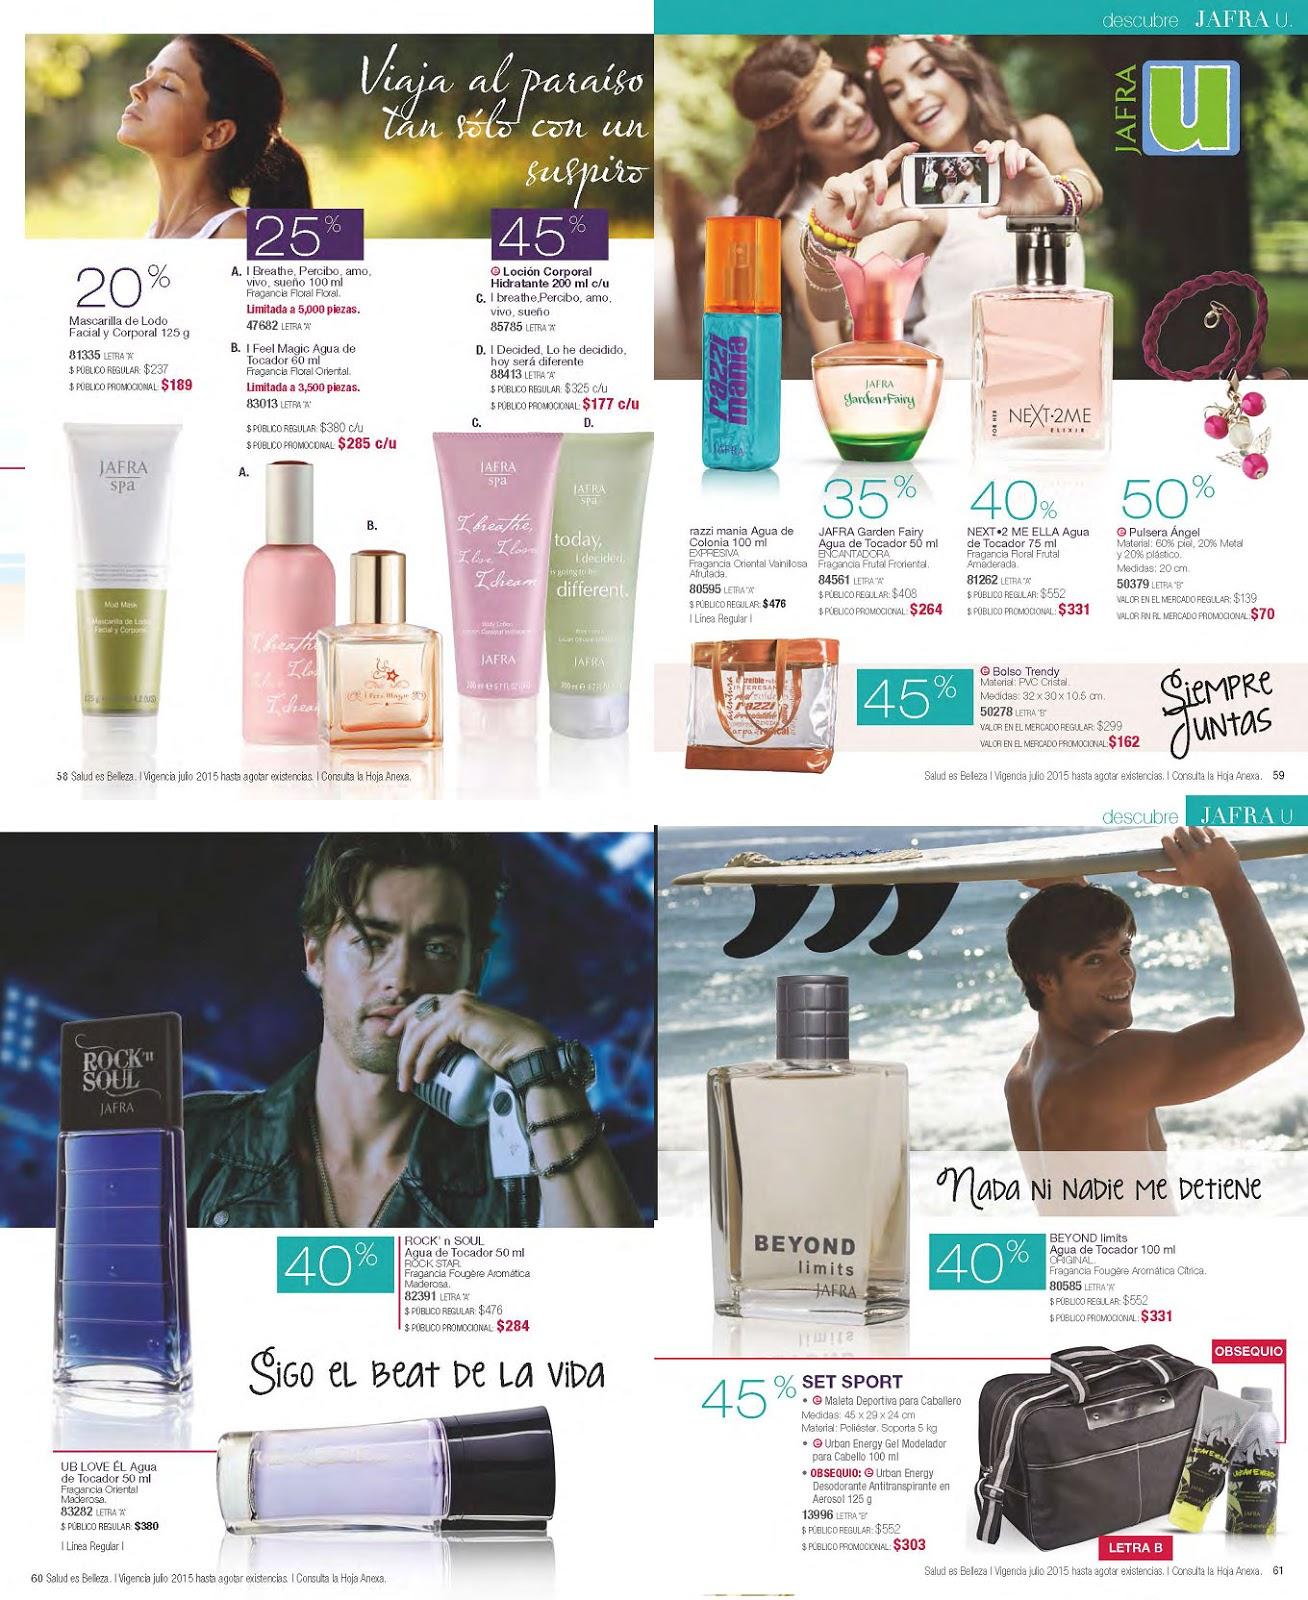 Linaje jafravic catalogo jafra oportunidades julio 2015 for Catalogo puntos bp